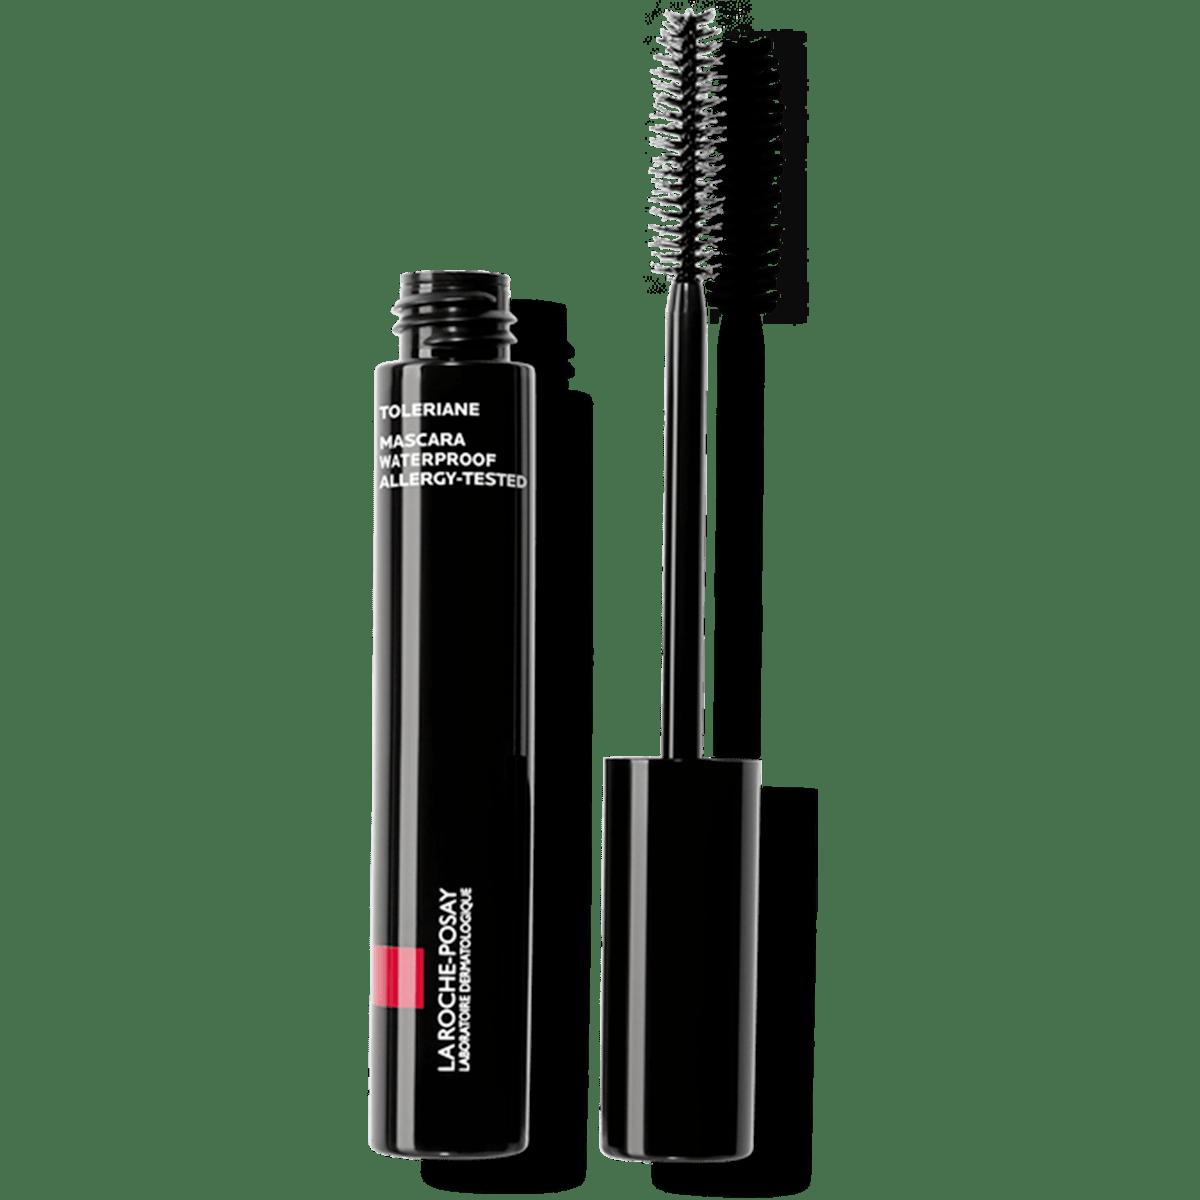 La Roche Posay Sensitive Toleriane Make up WATERPROOF_MASCARA_Black 33